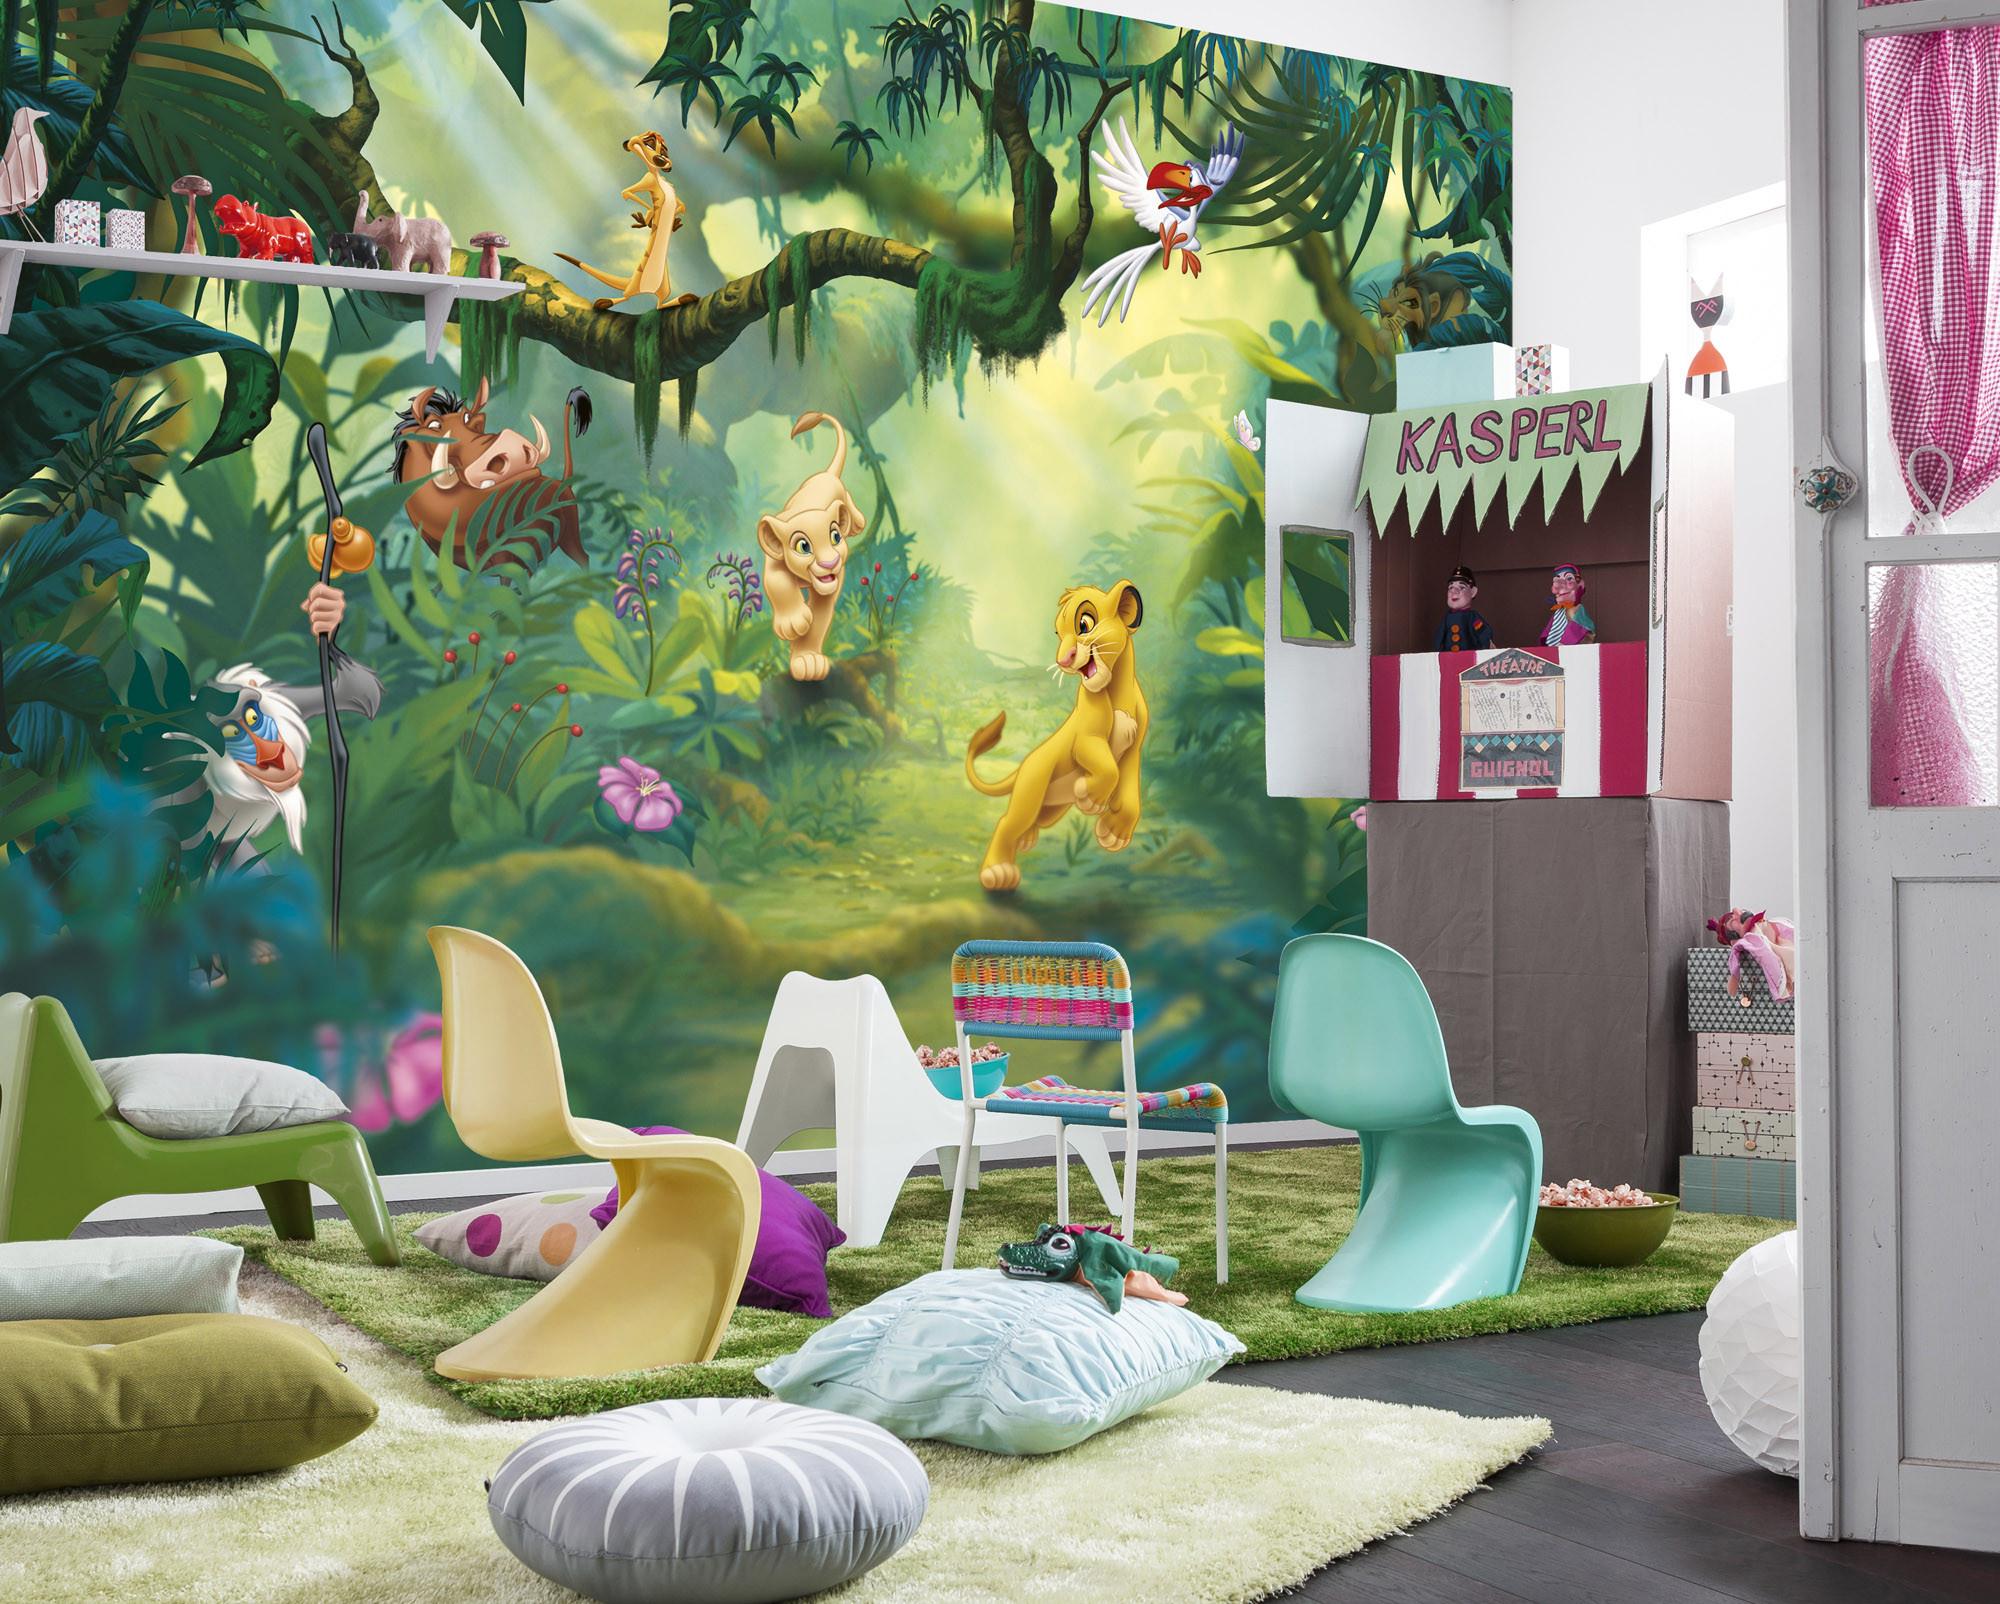 Fototapete Kinderzimmer Disney